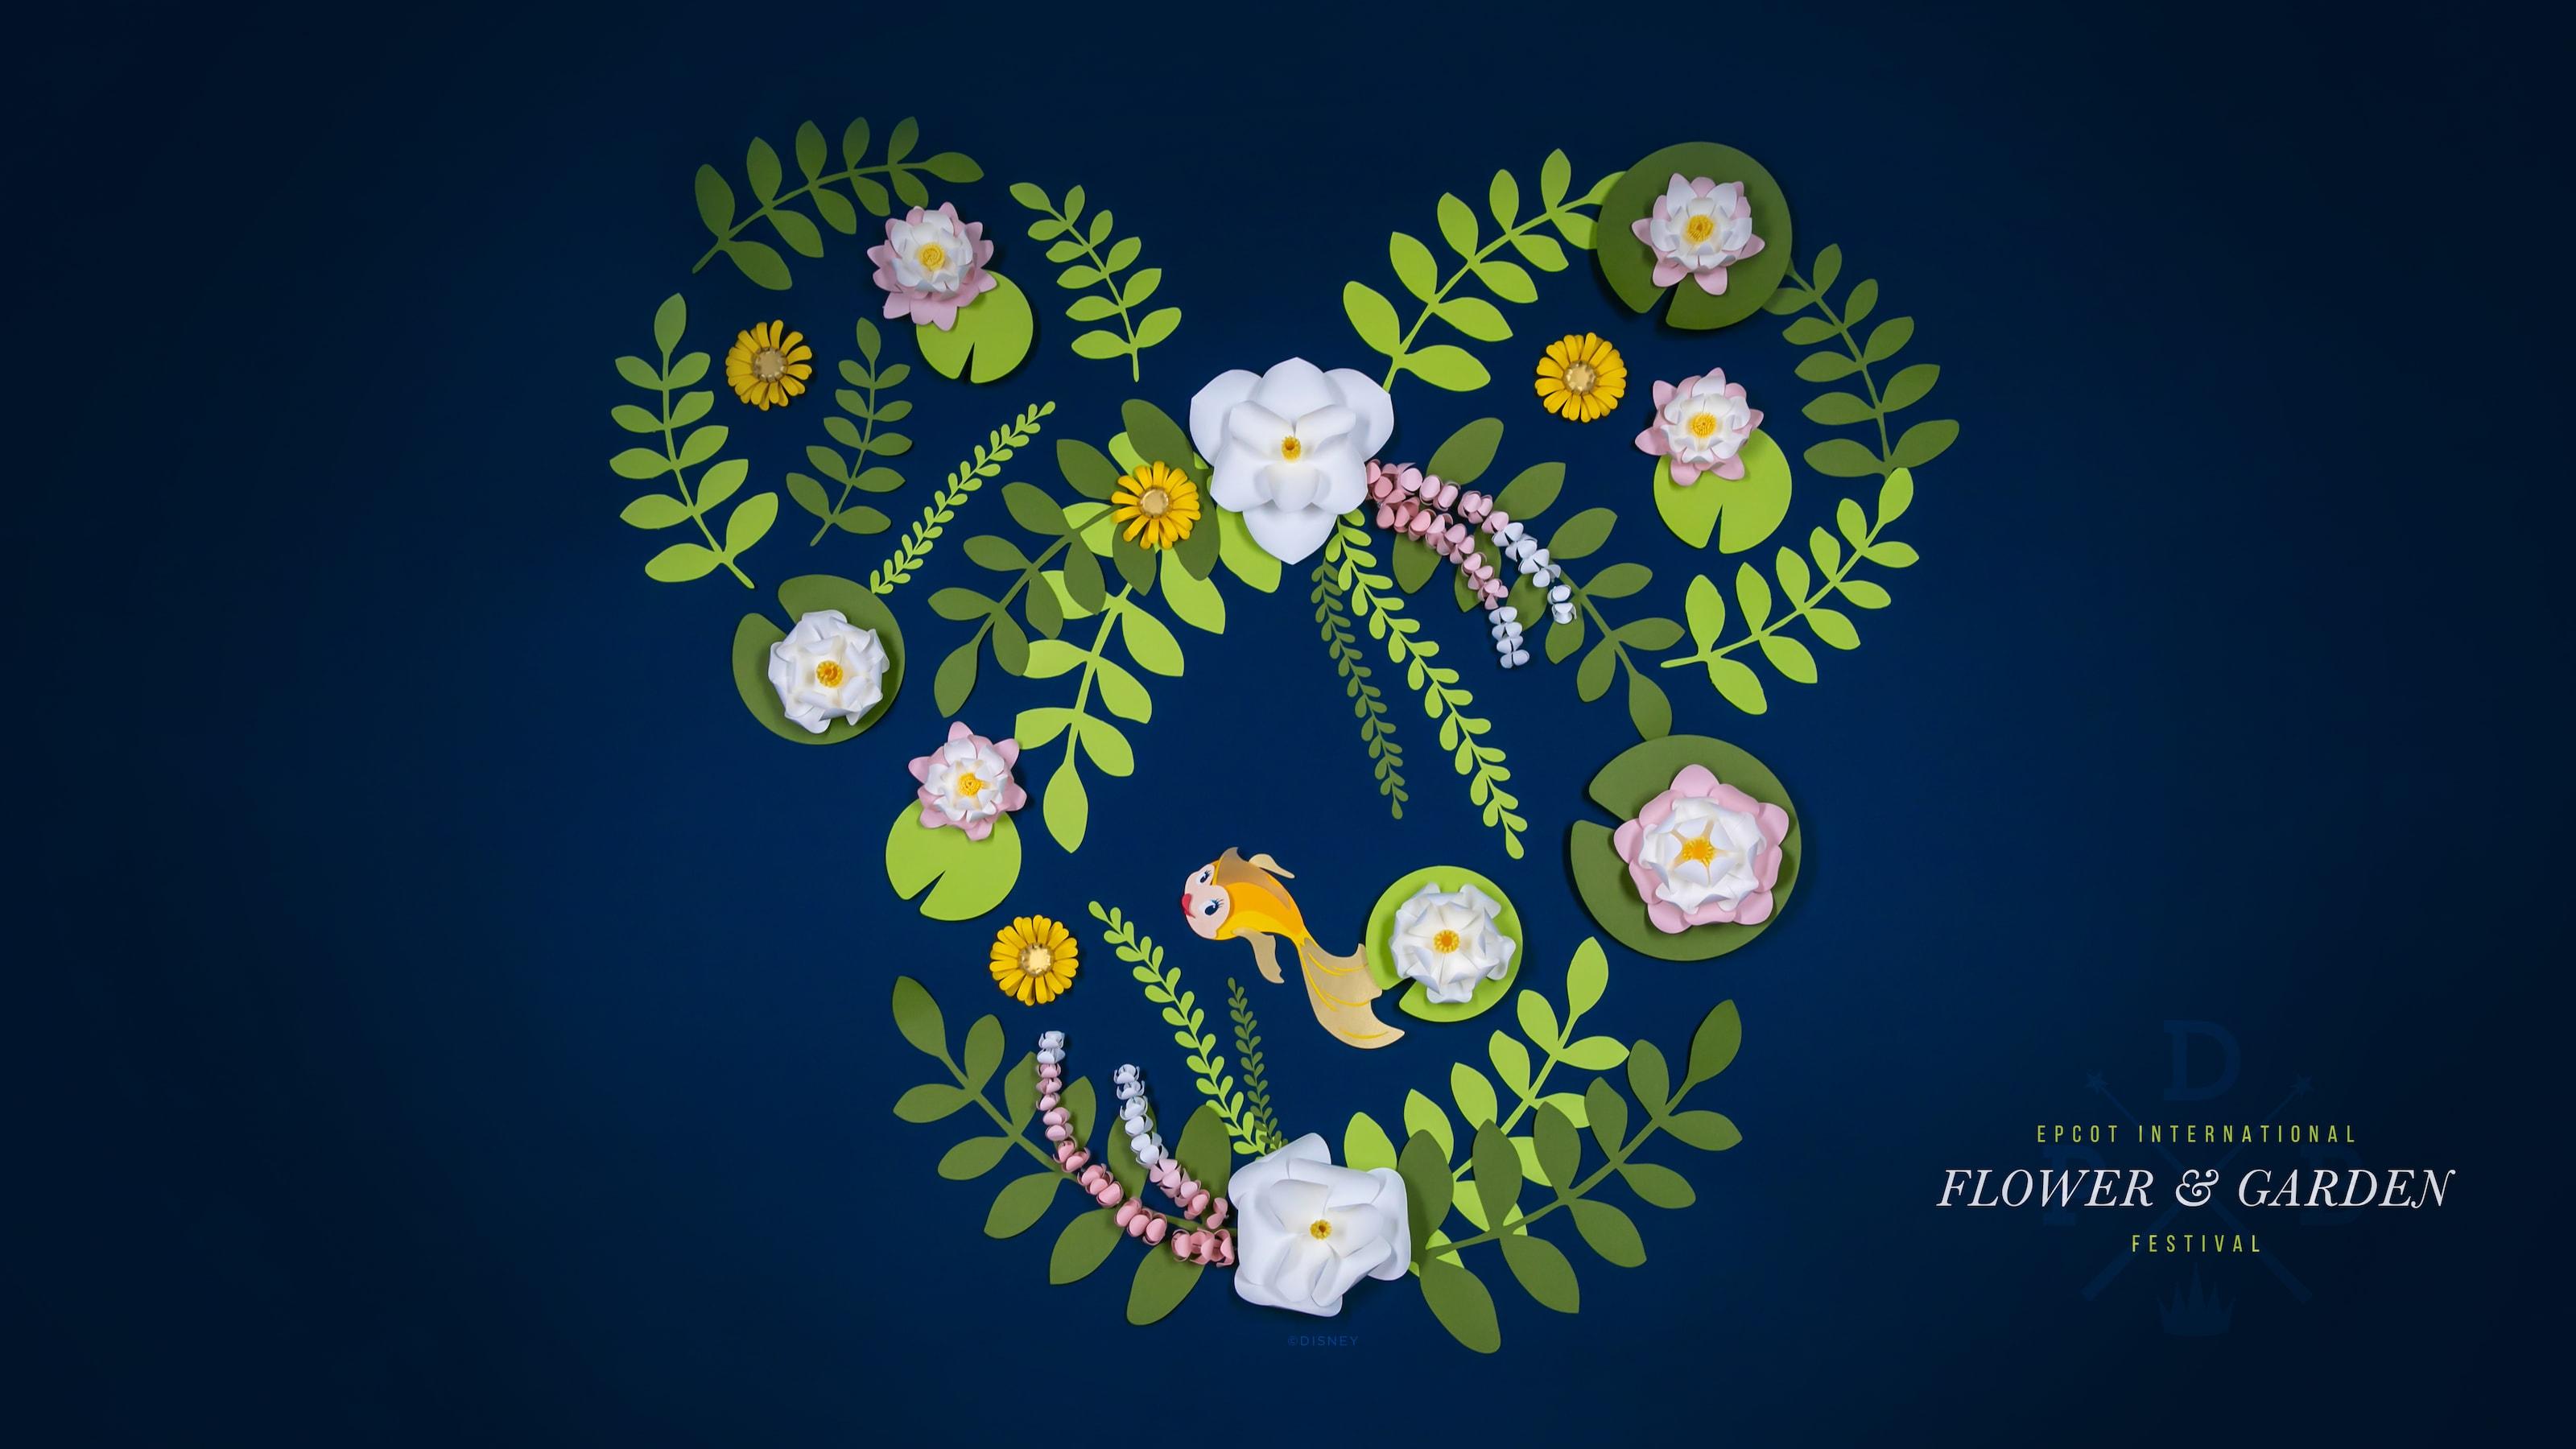 2019 Epcot International Flower Garden Festival Wallpaper